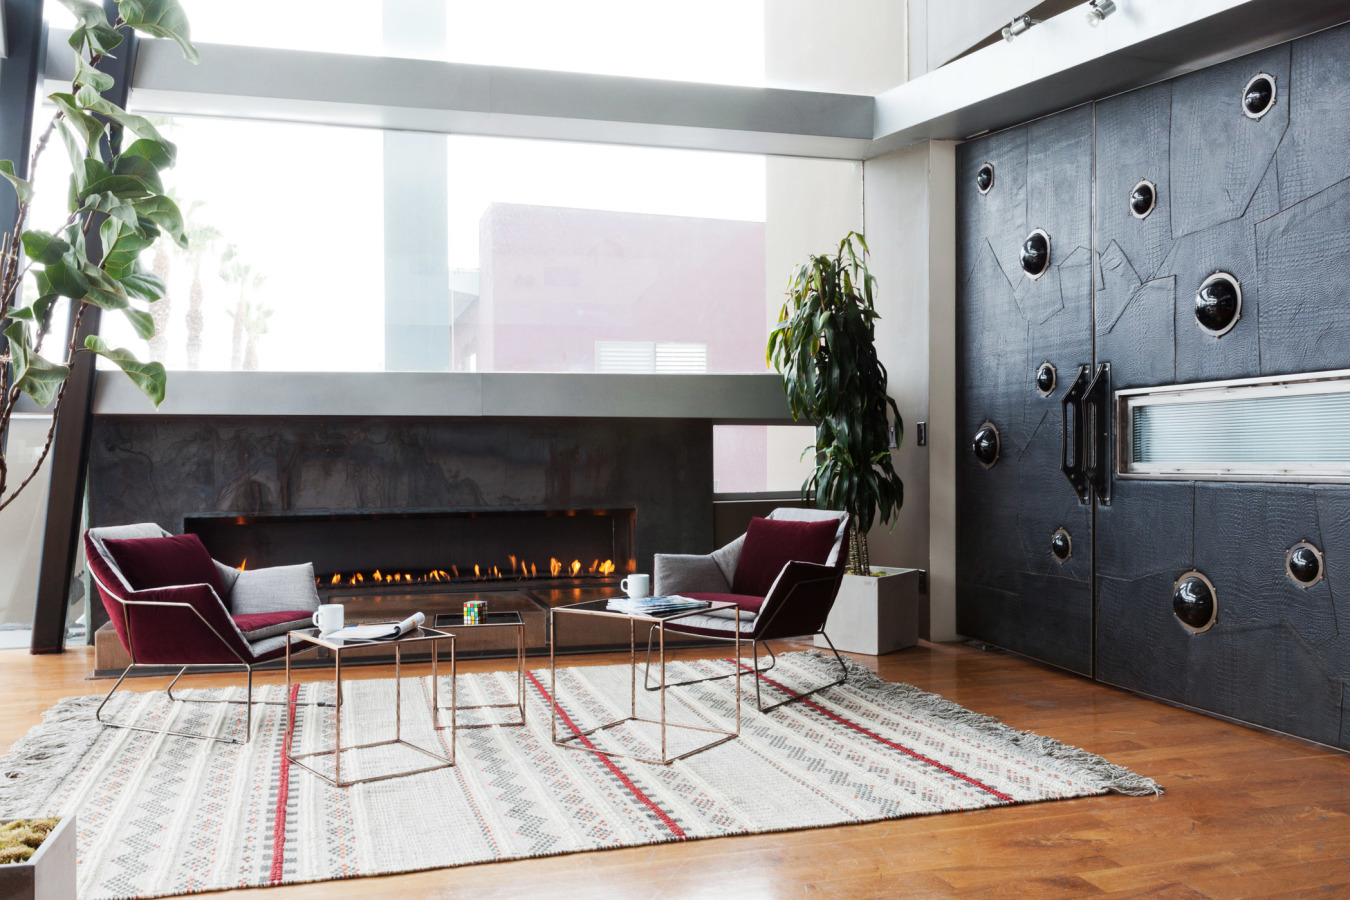 Homepolish-interior-design-2231d-1350x900.jpg